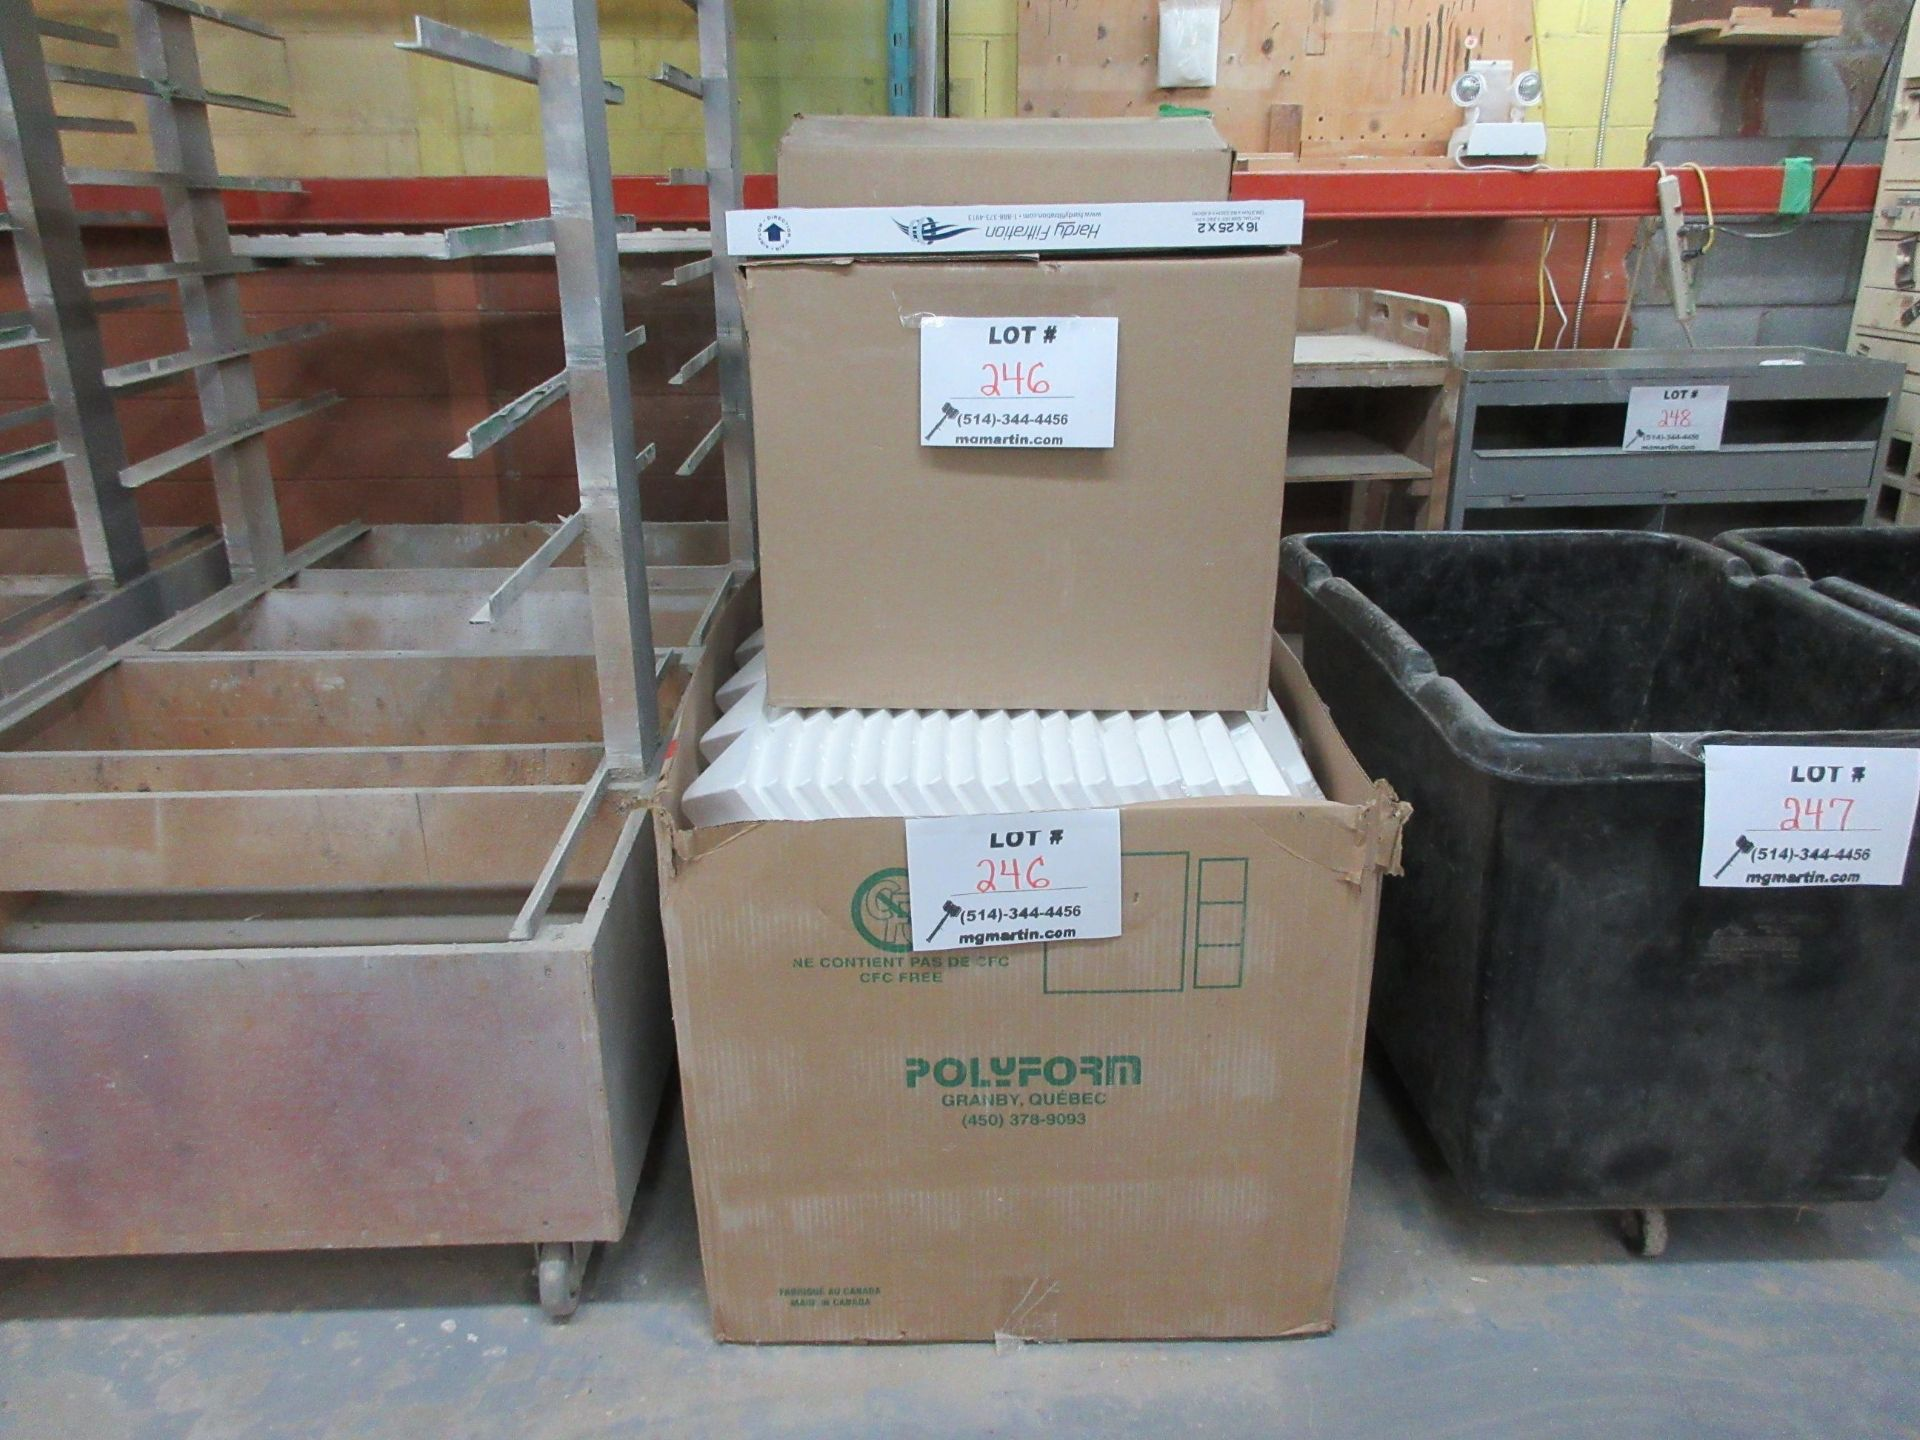 Lot 246 - LOT including styrofoam, filters, etc.